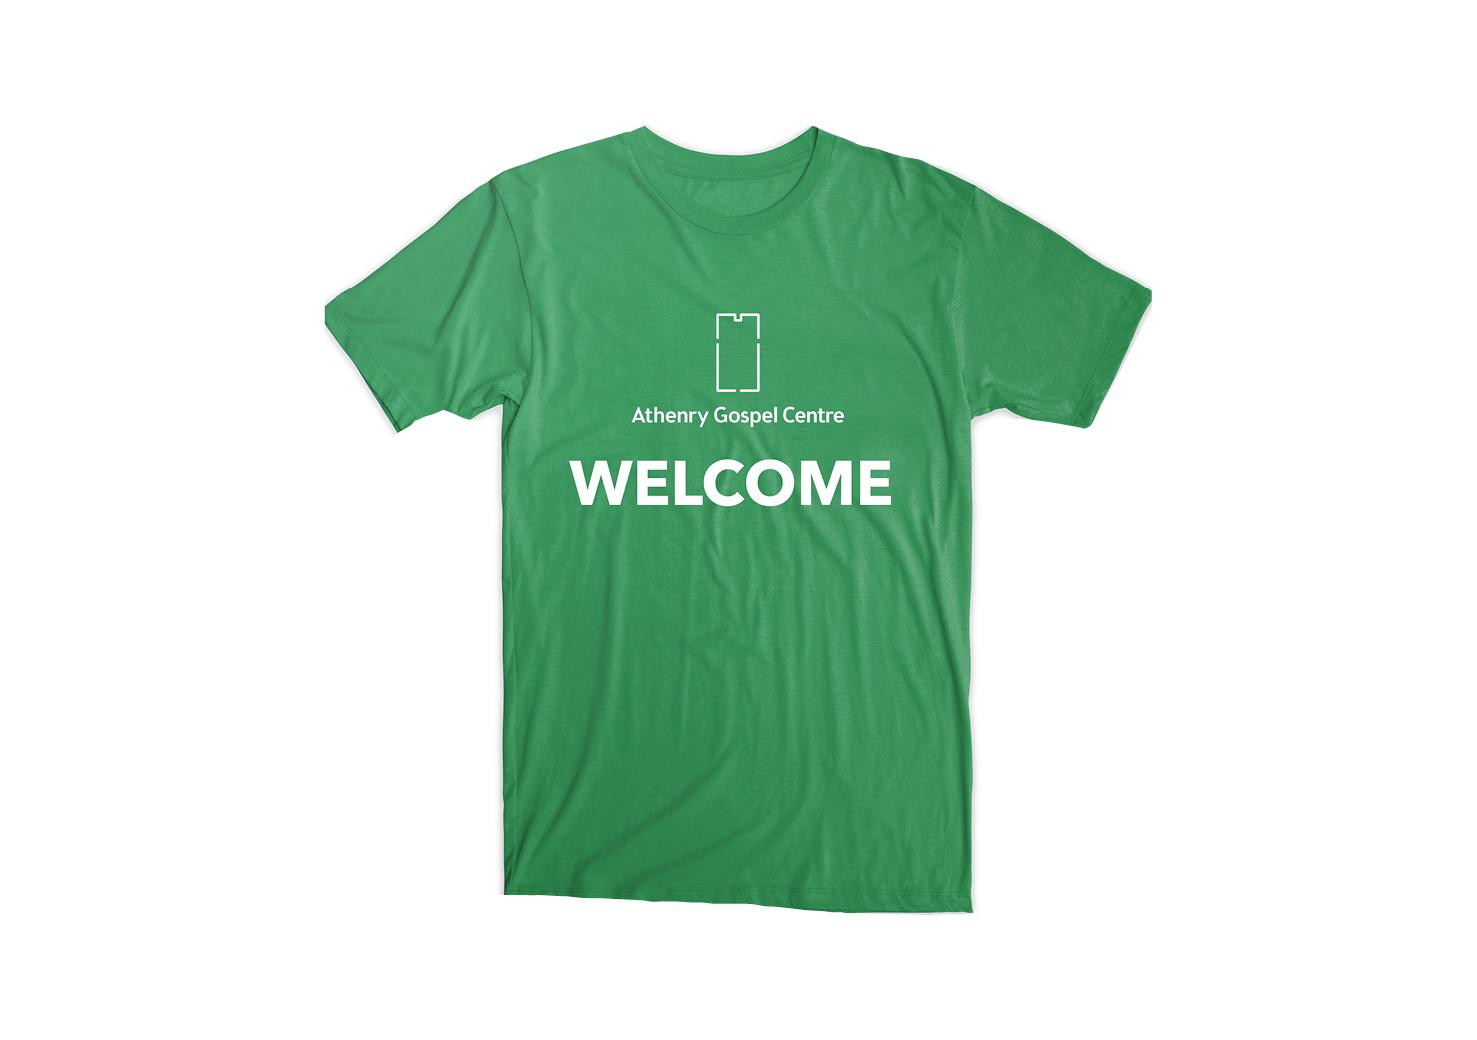 T-Shirt with logo design